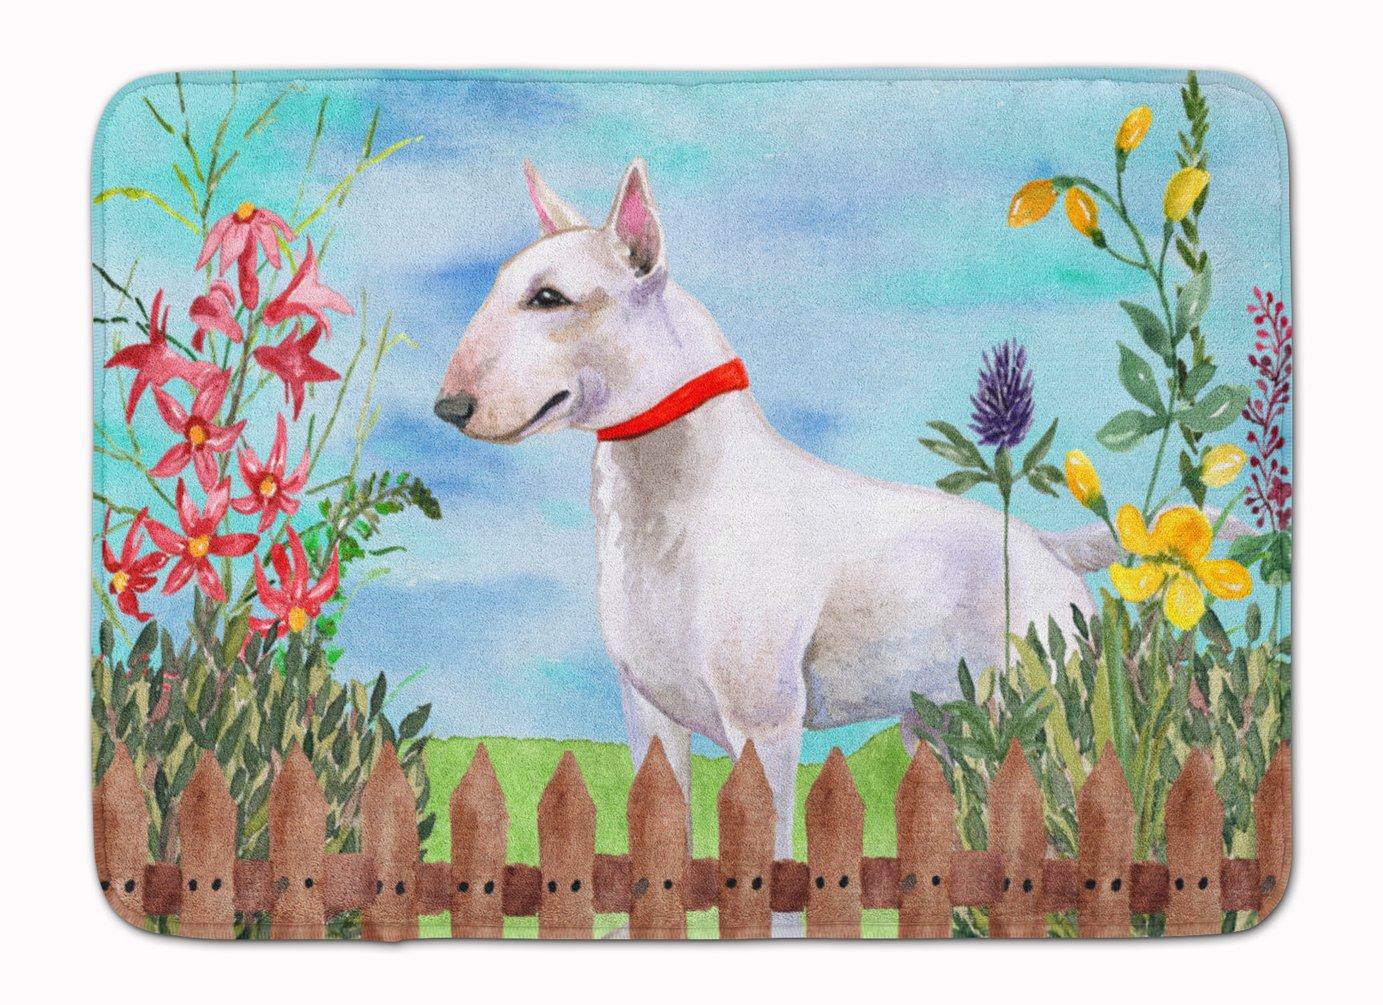 Carolines Treasures Bull Terrier Spring Floor Mat 19 x 27 Multicolor